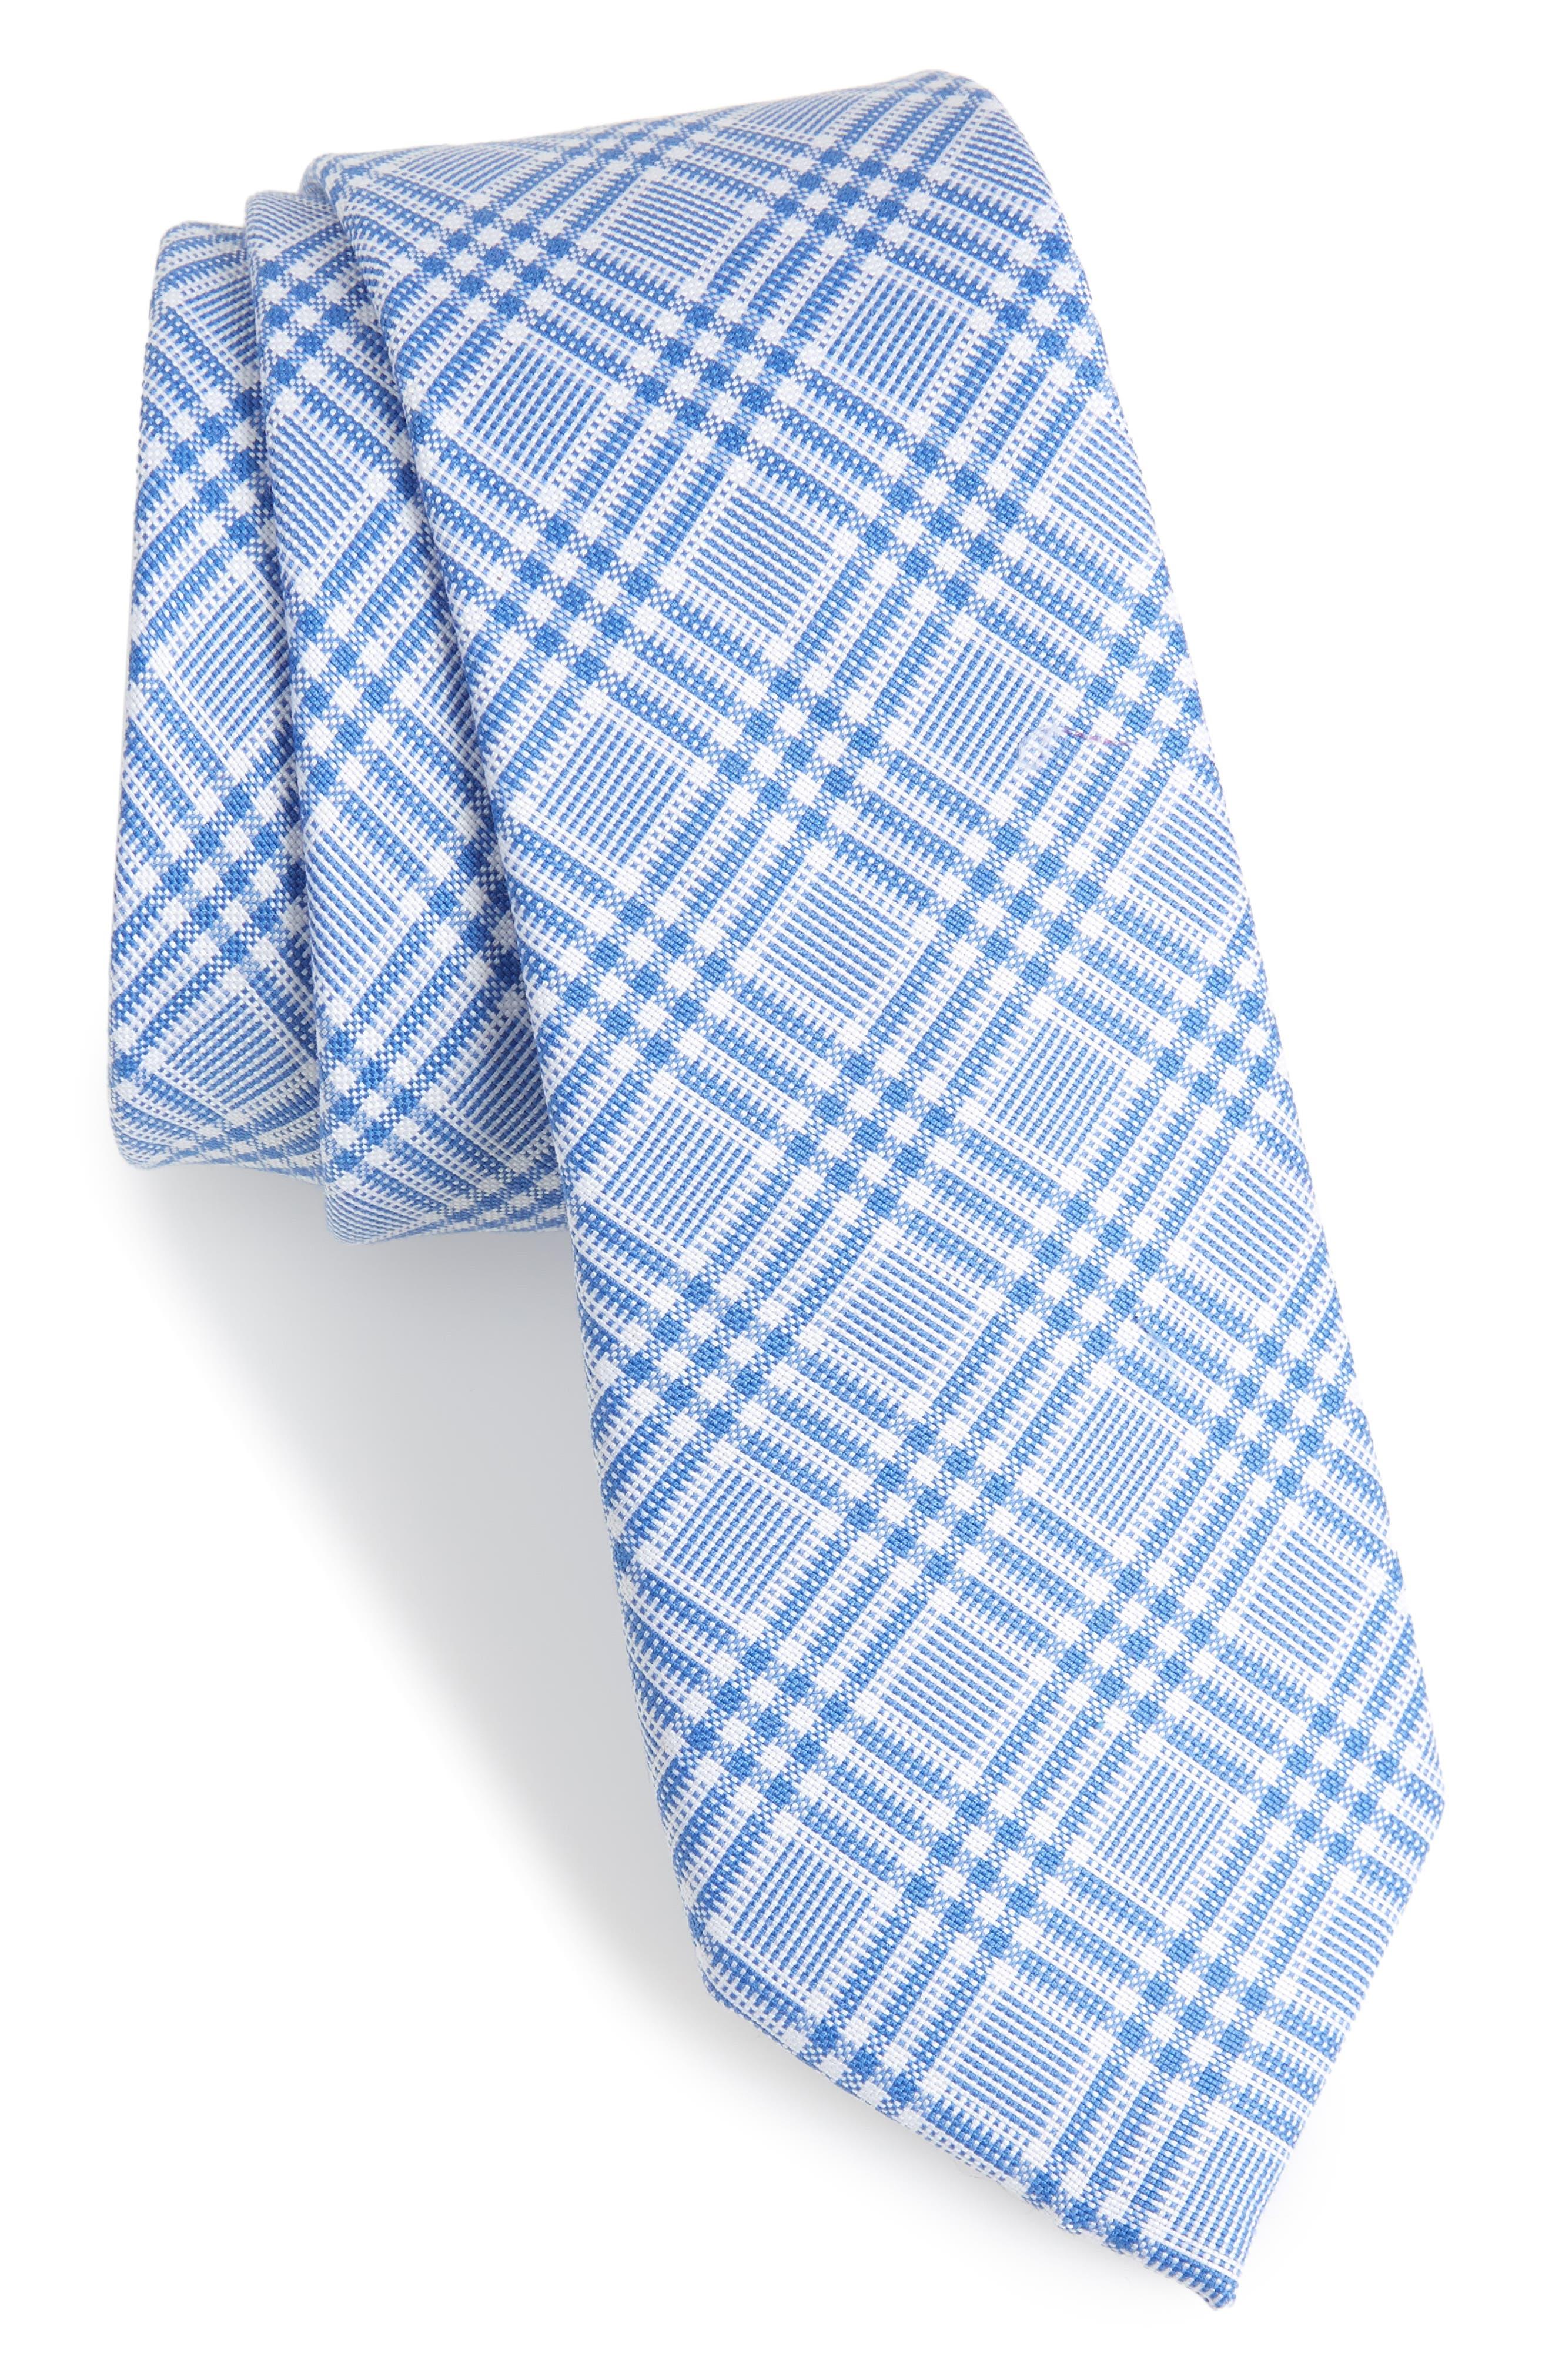 Brook Plaid Cotton Skinny Tie,                             Main thumbnail 1, color,                             Blue